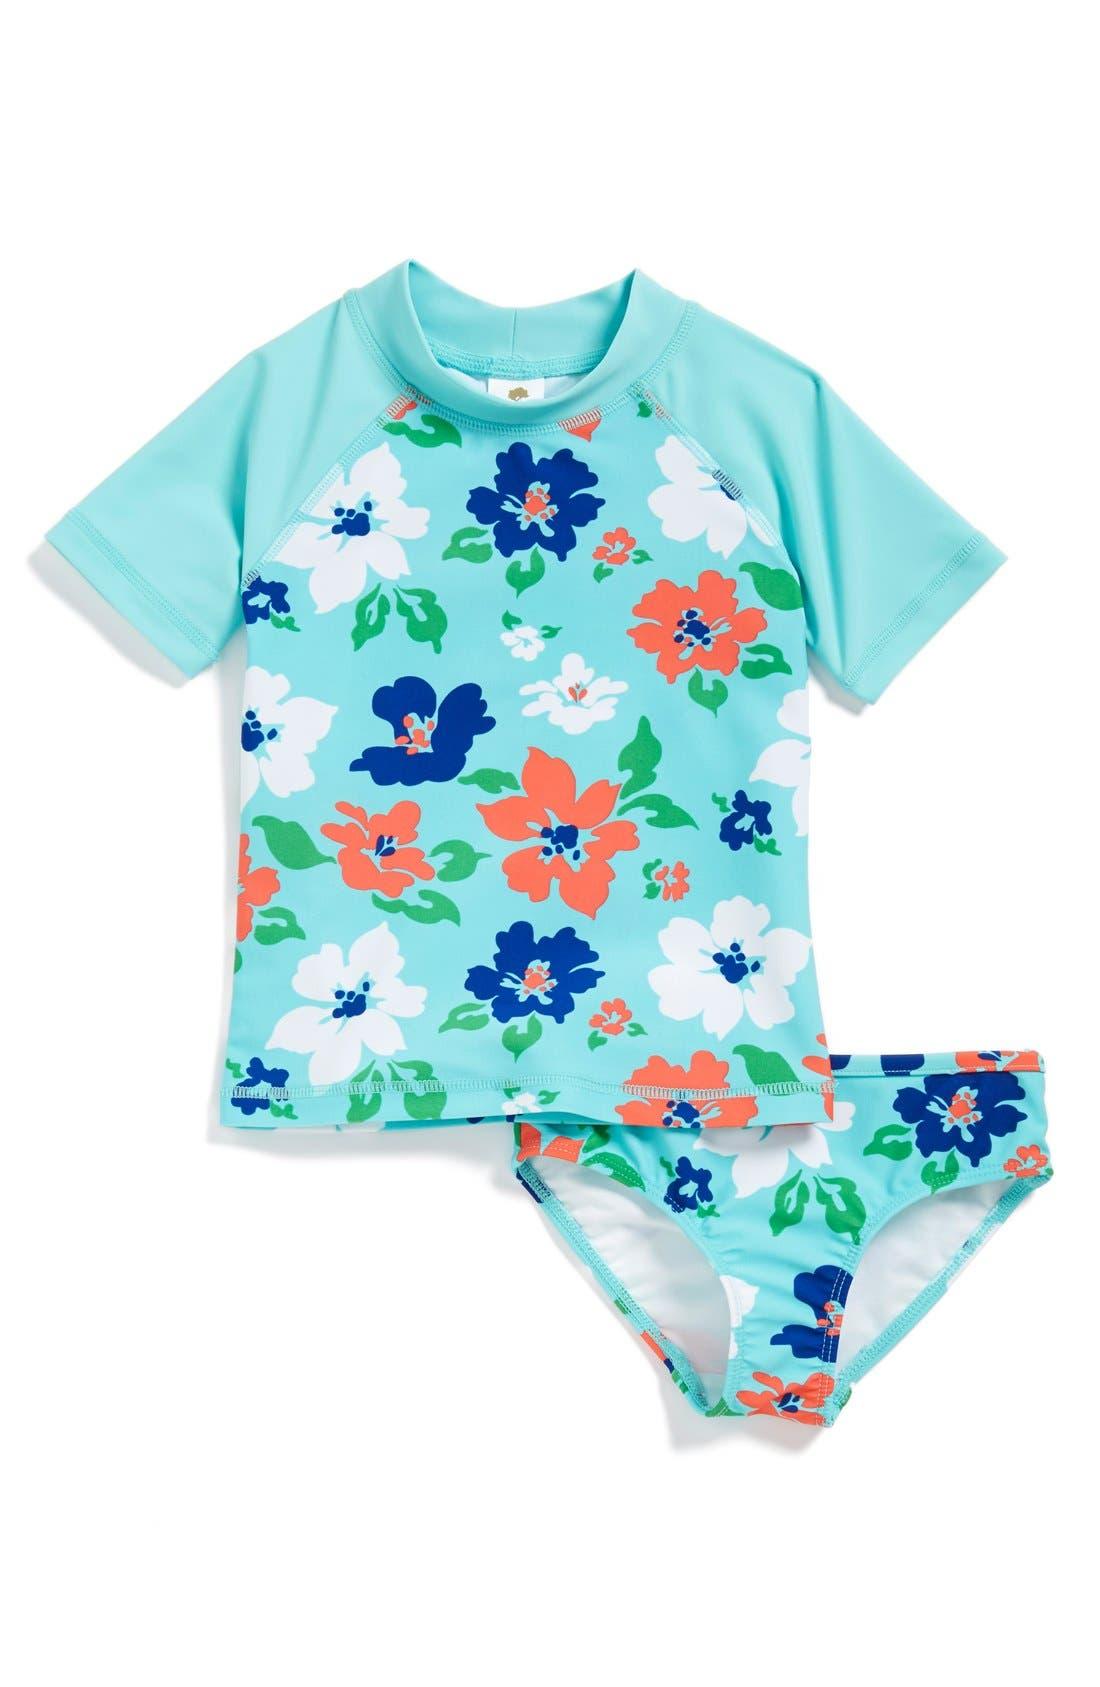 Alternate Image 1 Selected - Tucker + Tate 'Montauk' Rashguard Shirt & Bottoms (Little Girls & Big Girls)